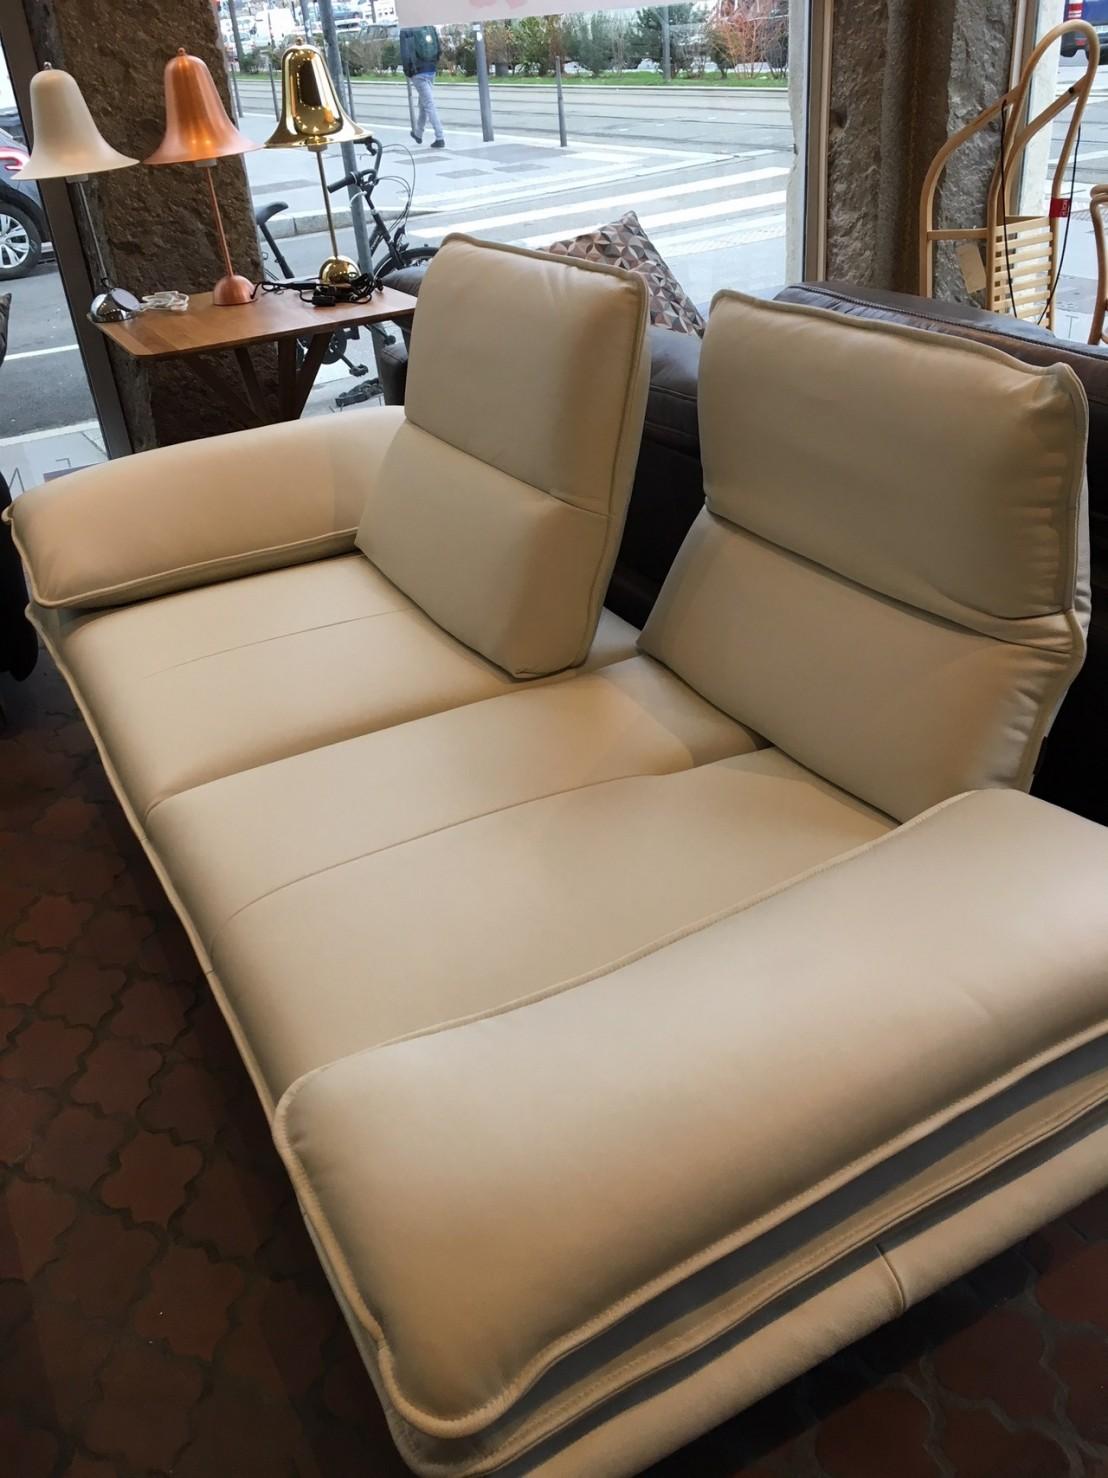 Canap banc design cuir blanc miami alwin c for Teindre canape cuir